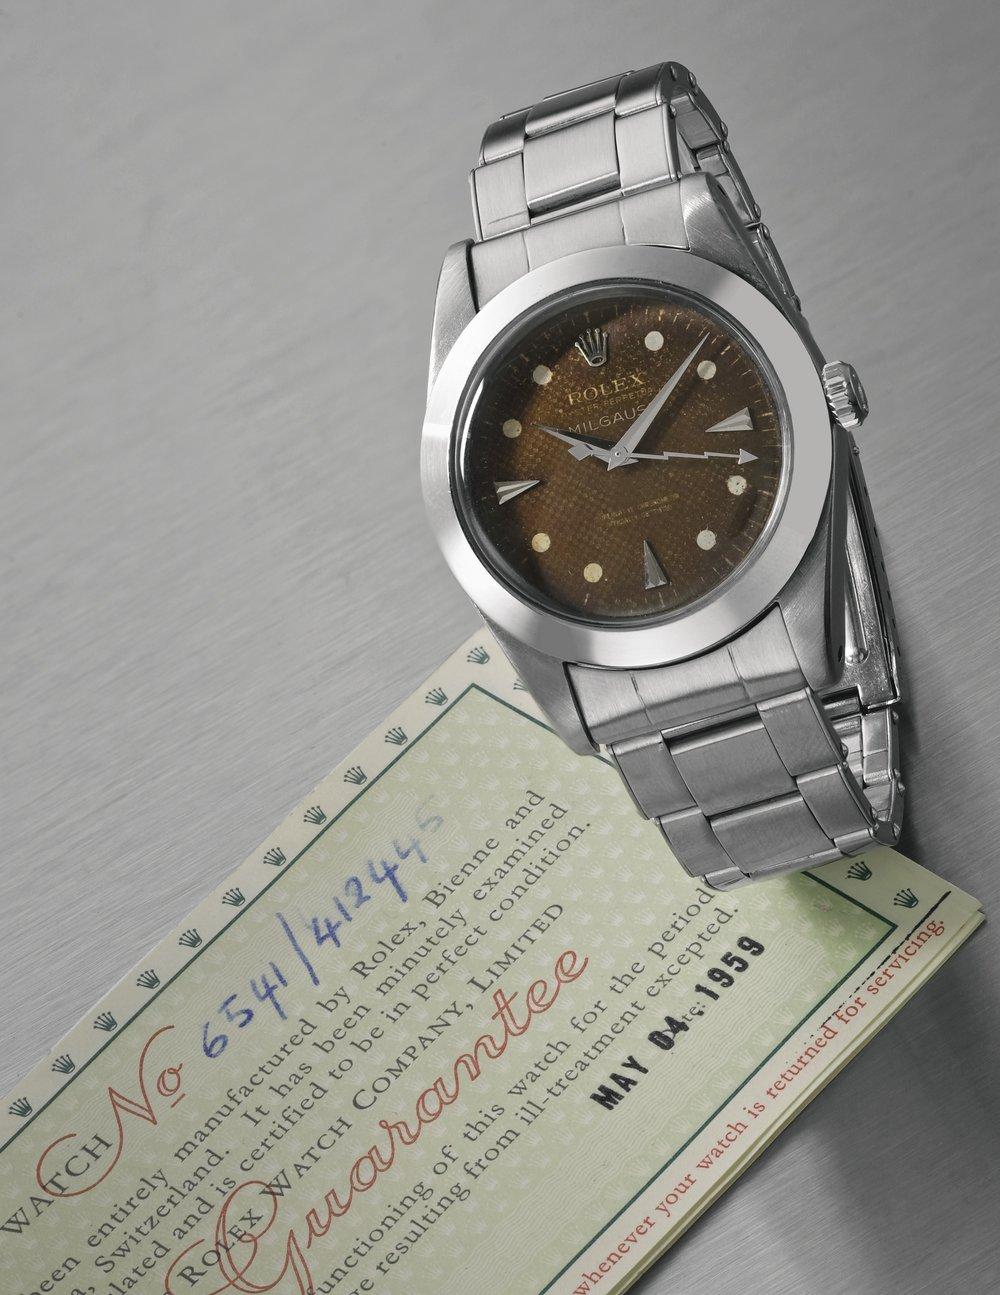 Rolex Milgauss Ref. 6541 with rare smooth bezel, circa 1959